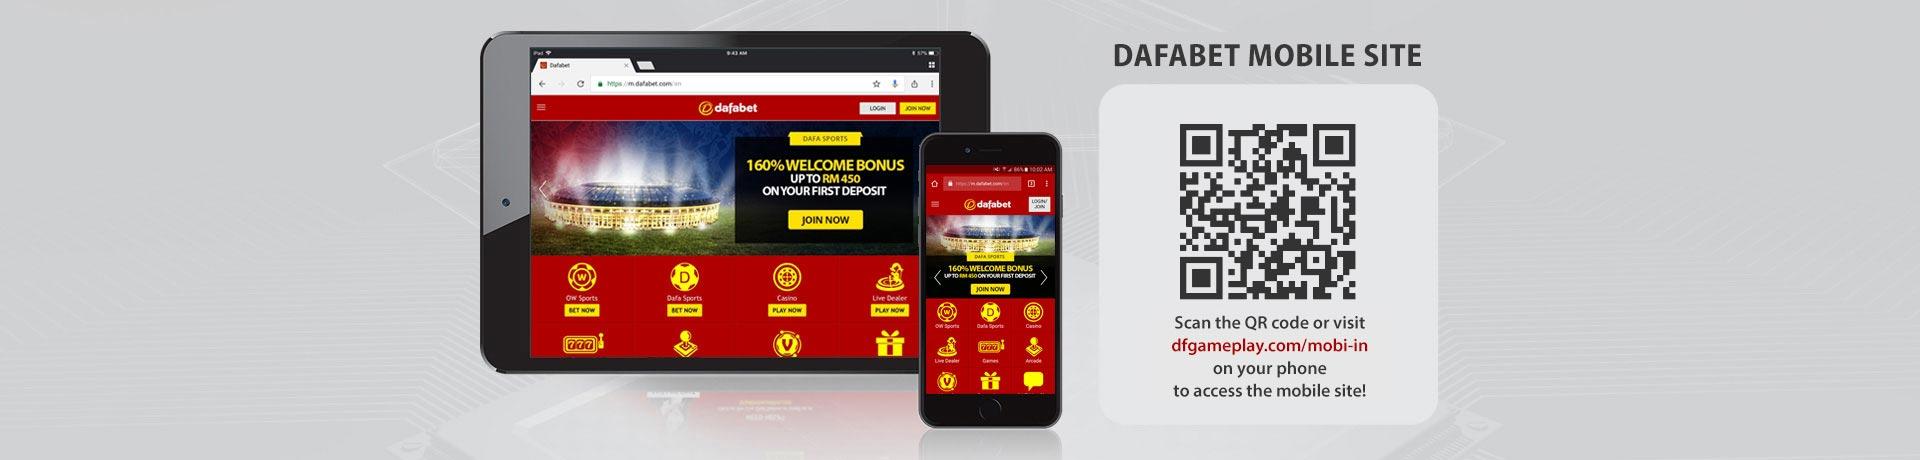 Dafabet mobile betting in uganda bitcoins news 2021 scott